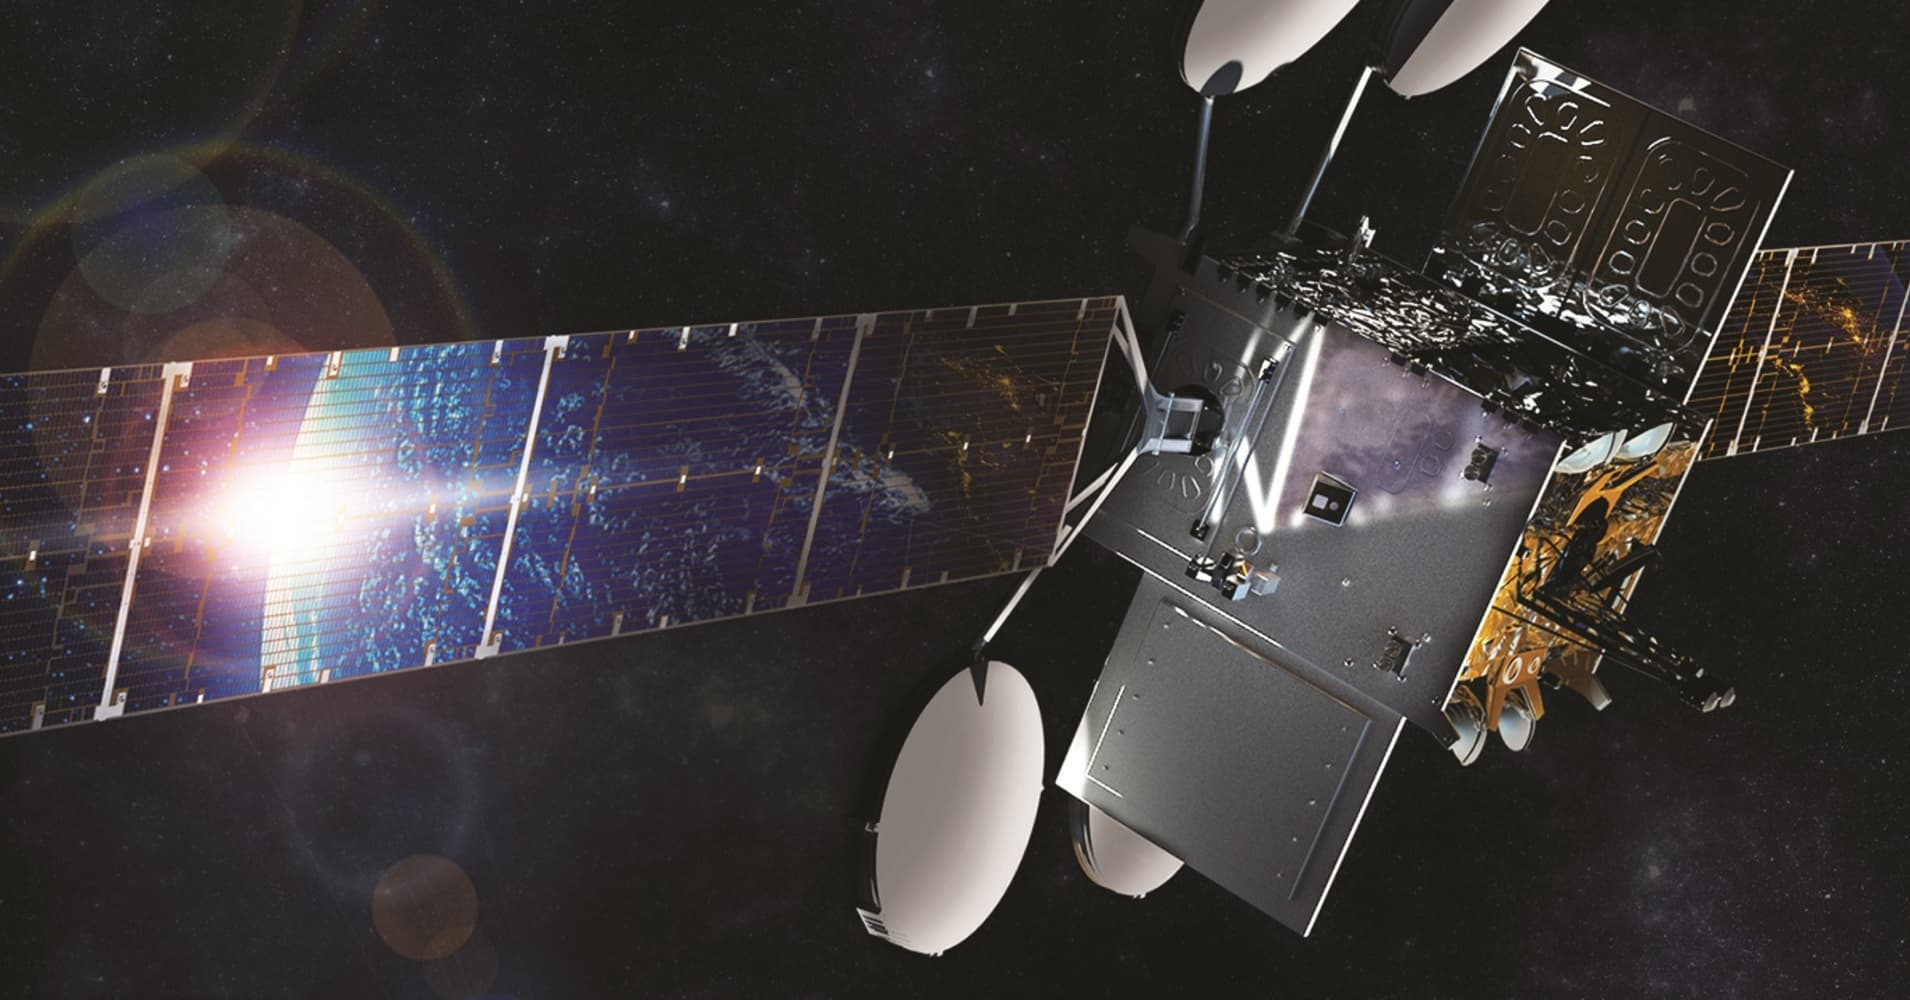 105031600-edited_viasat_2_satellite_with_flare.1910x1000